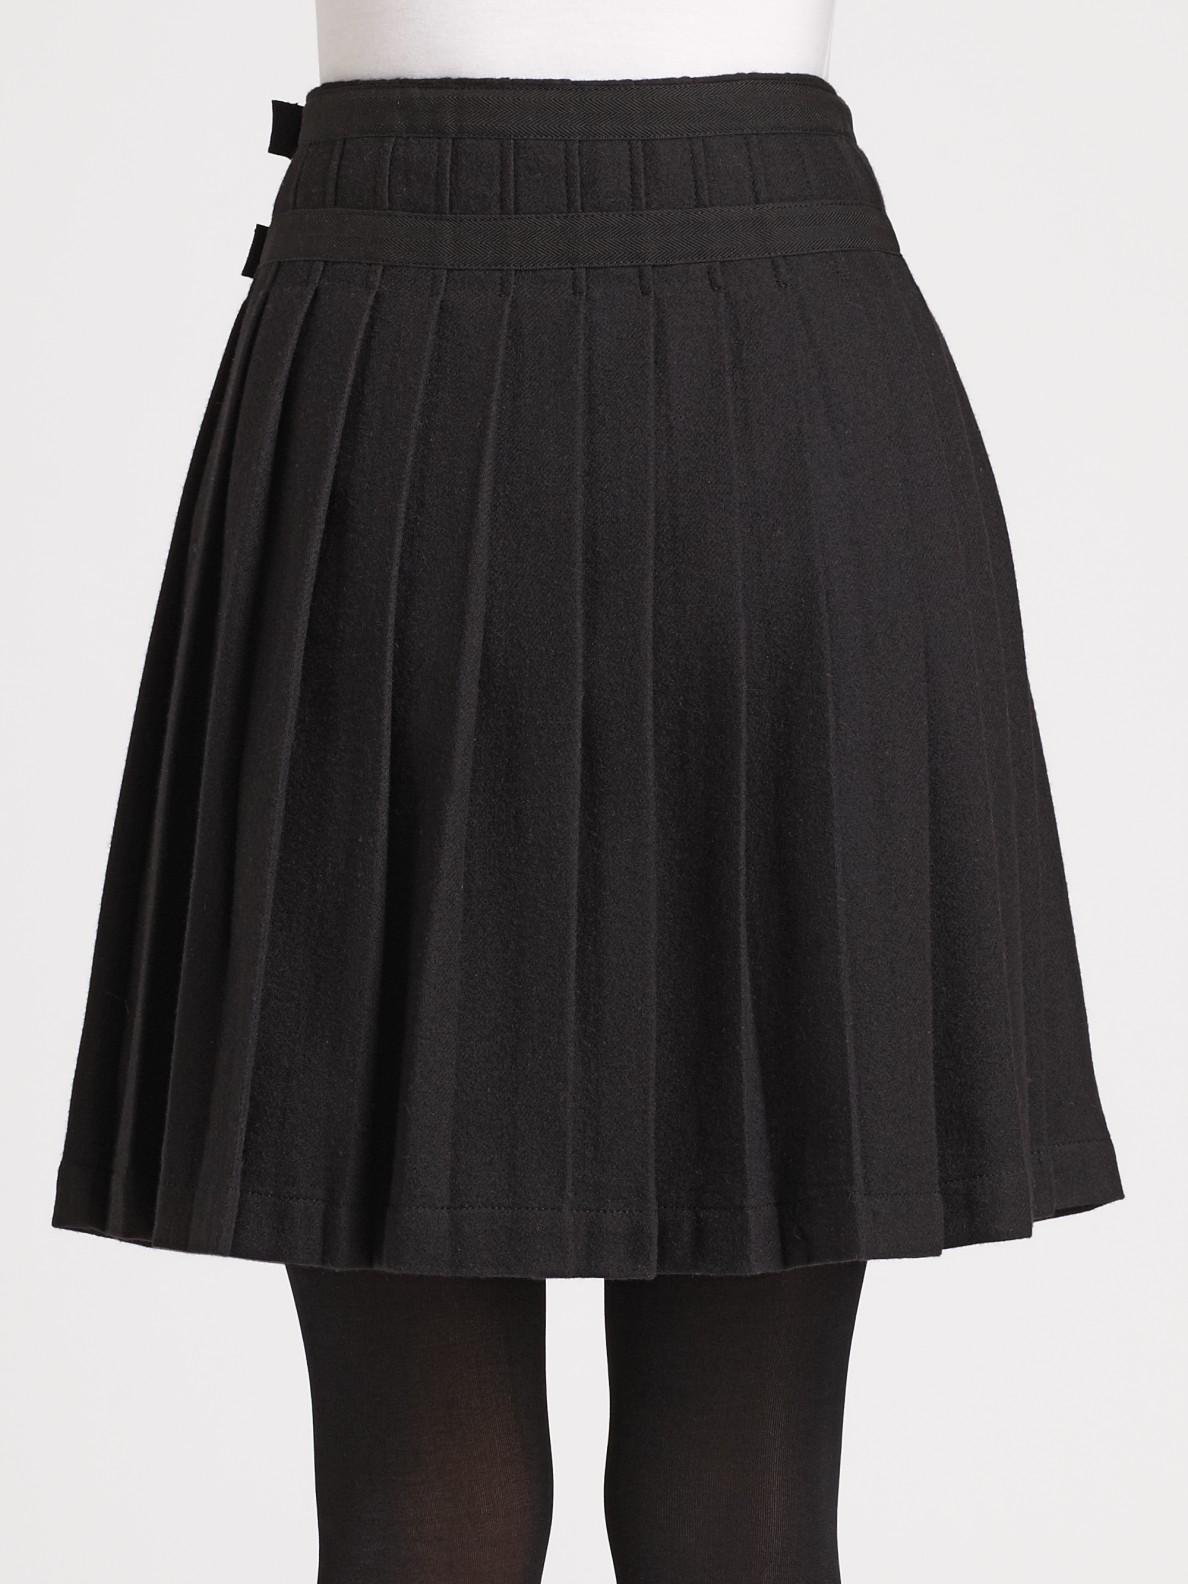 Betsey Johnson Dresses